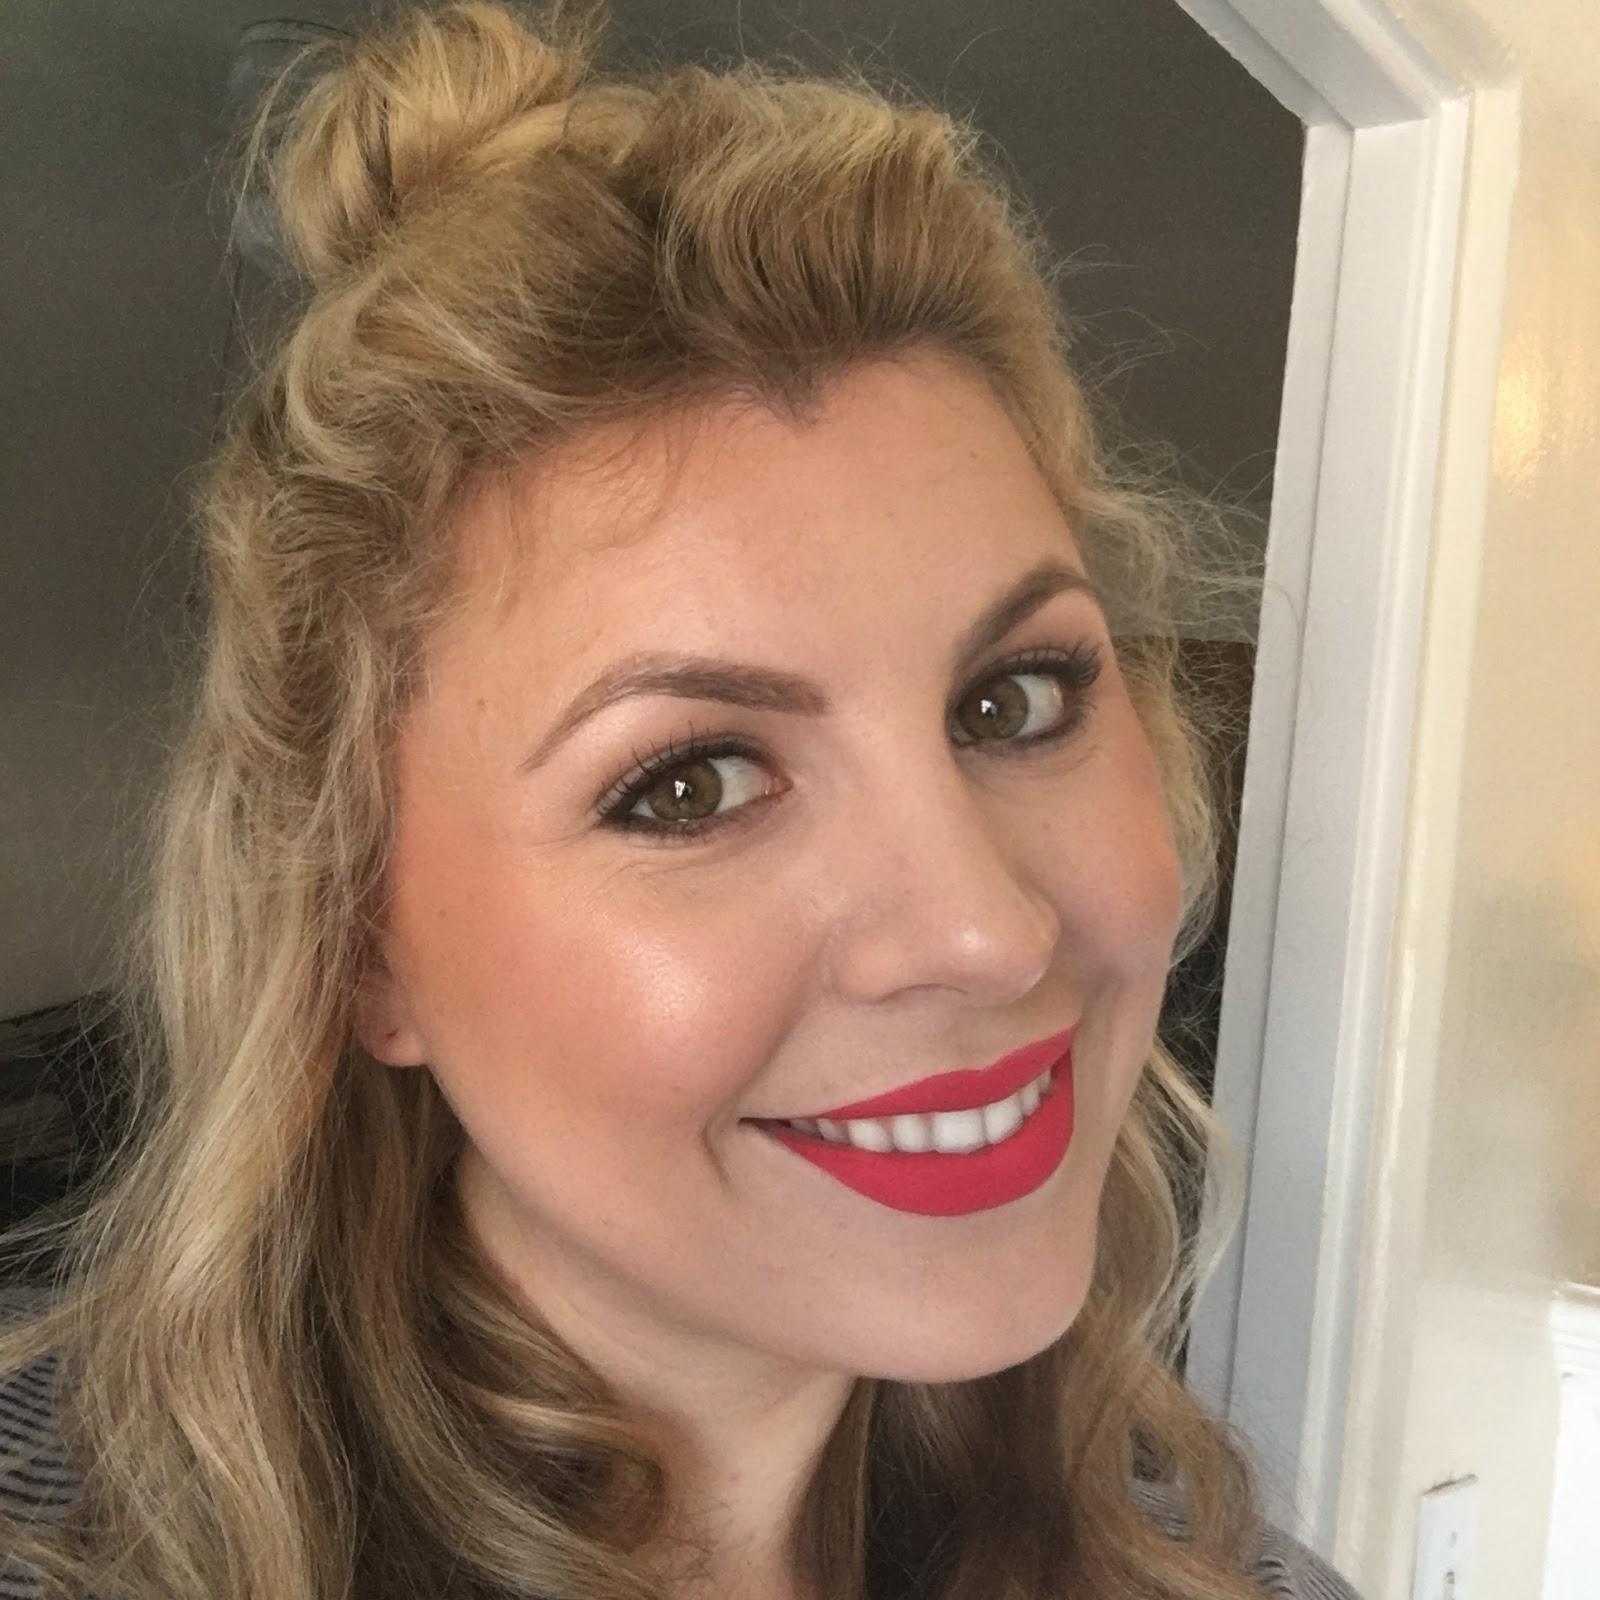 Anastasia Beverly Hills Carina Liquid Lipstick